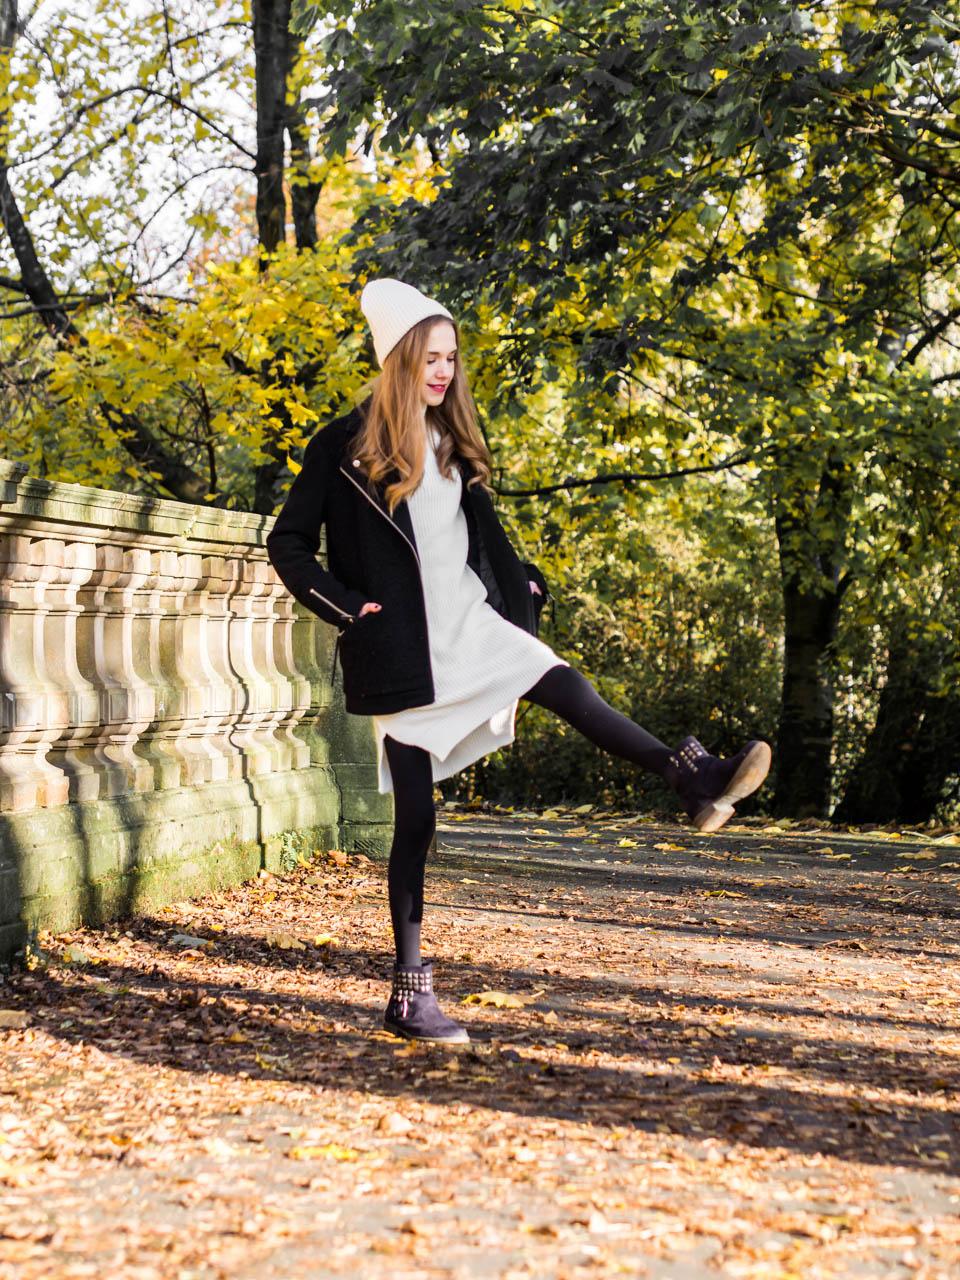 Black and white autumn outfit - Mustavalkoinen asu, syysmuoti